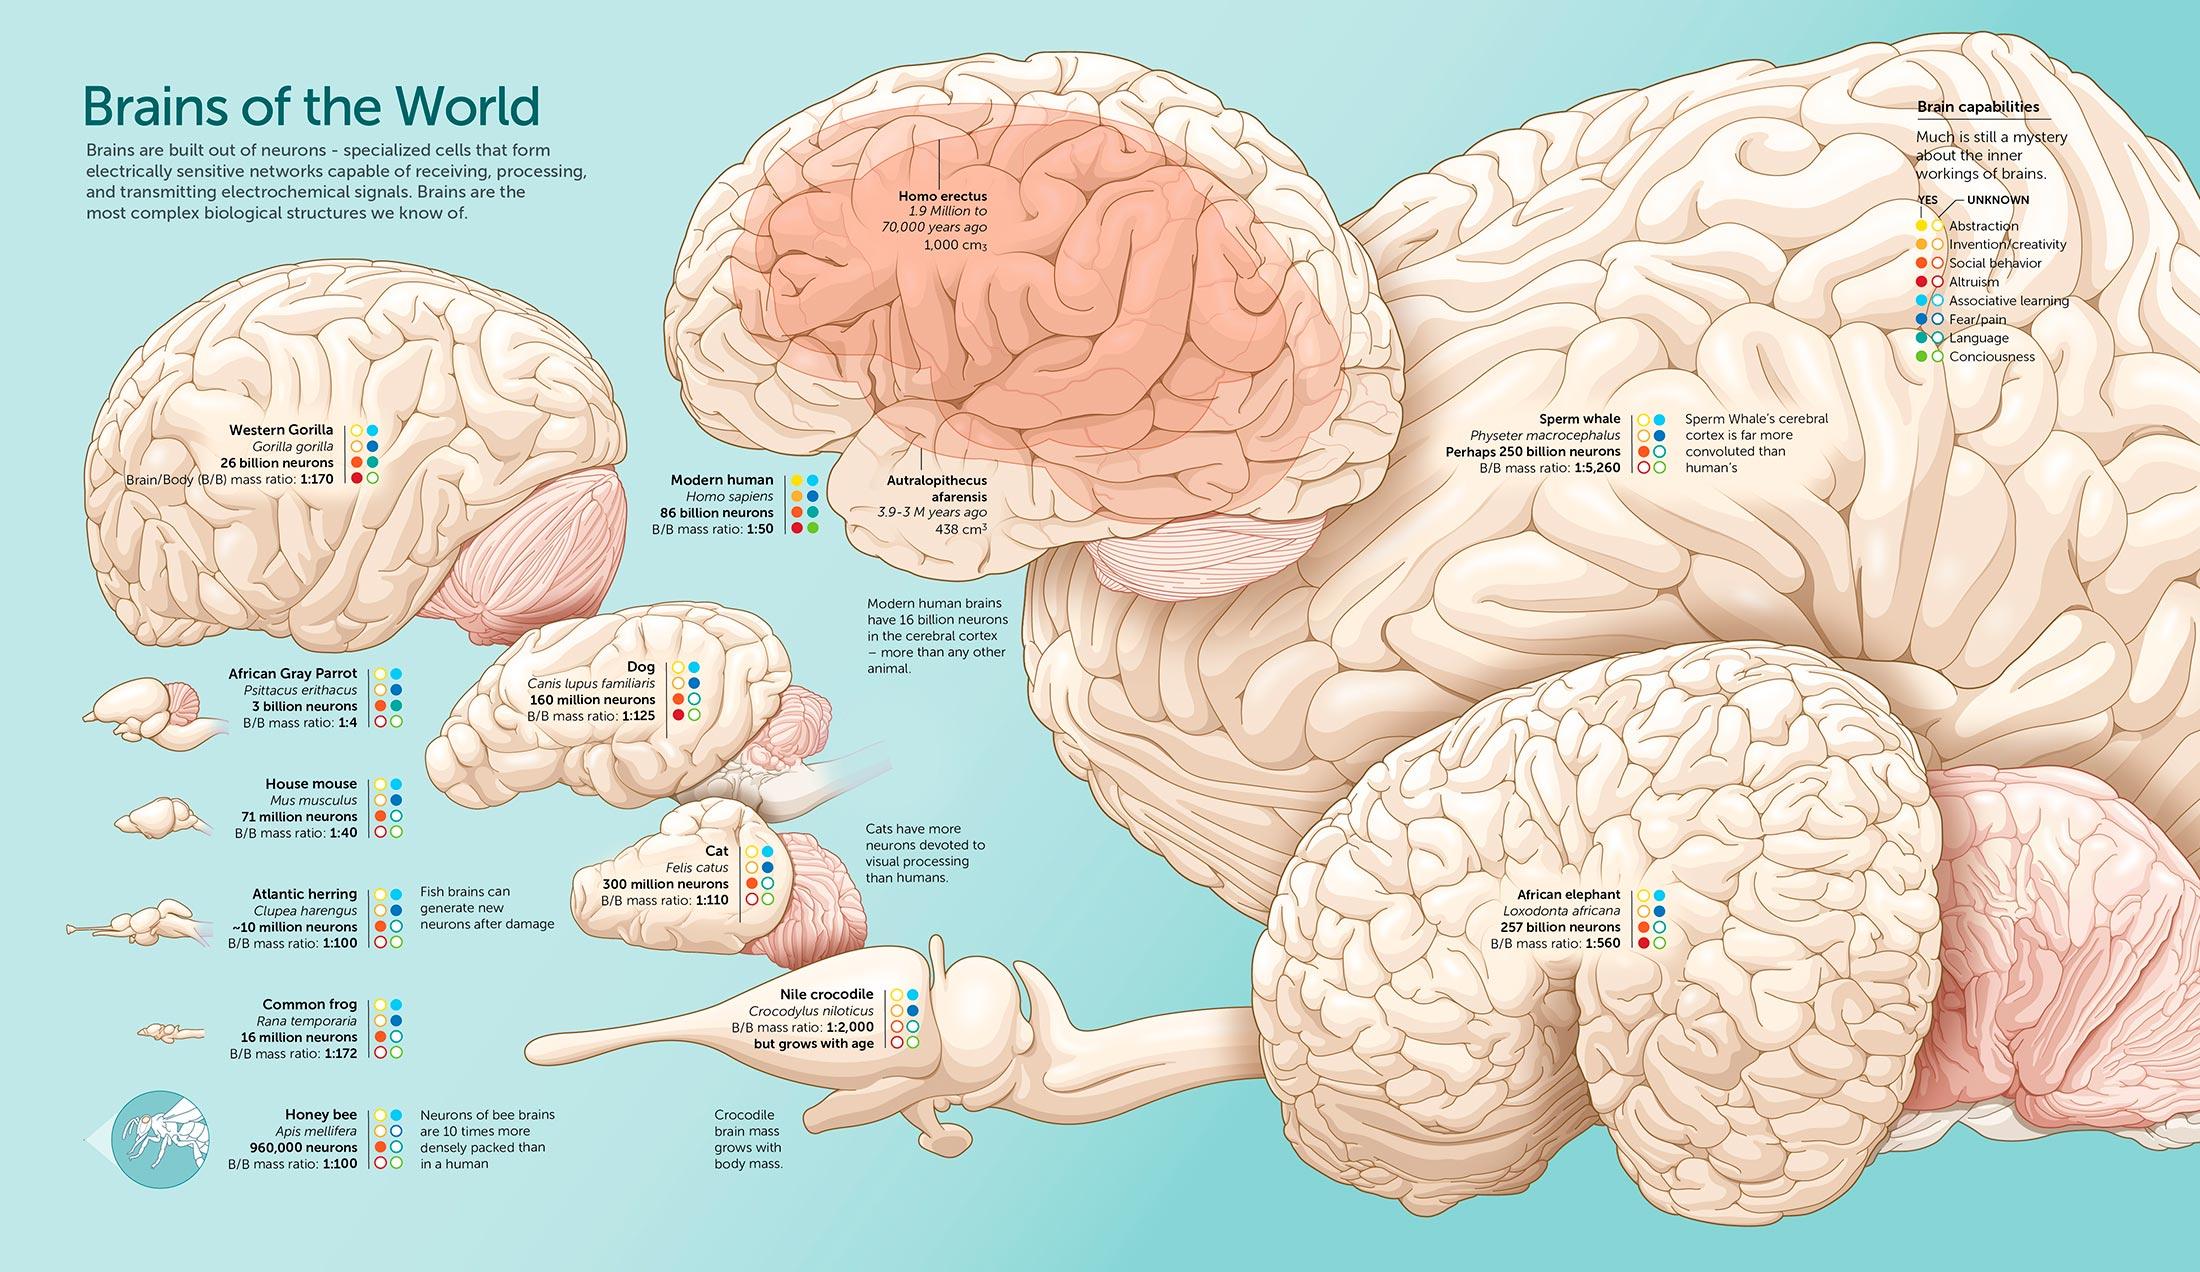 Инфографика: Сравнение мозга человека